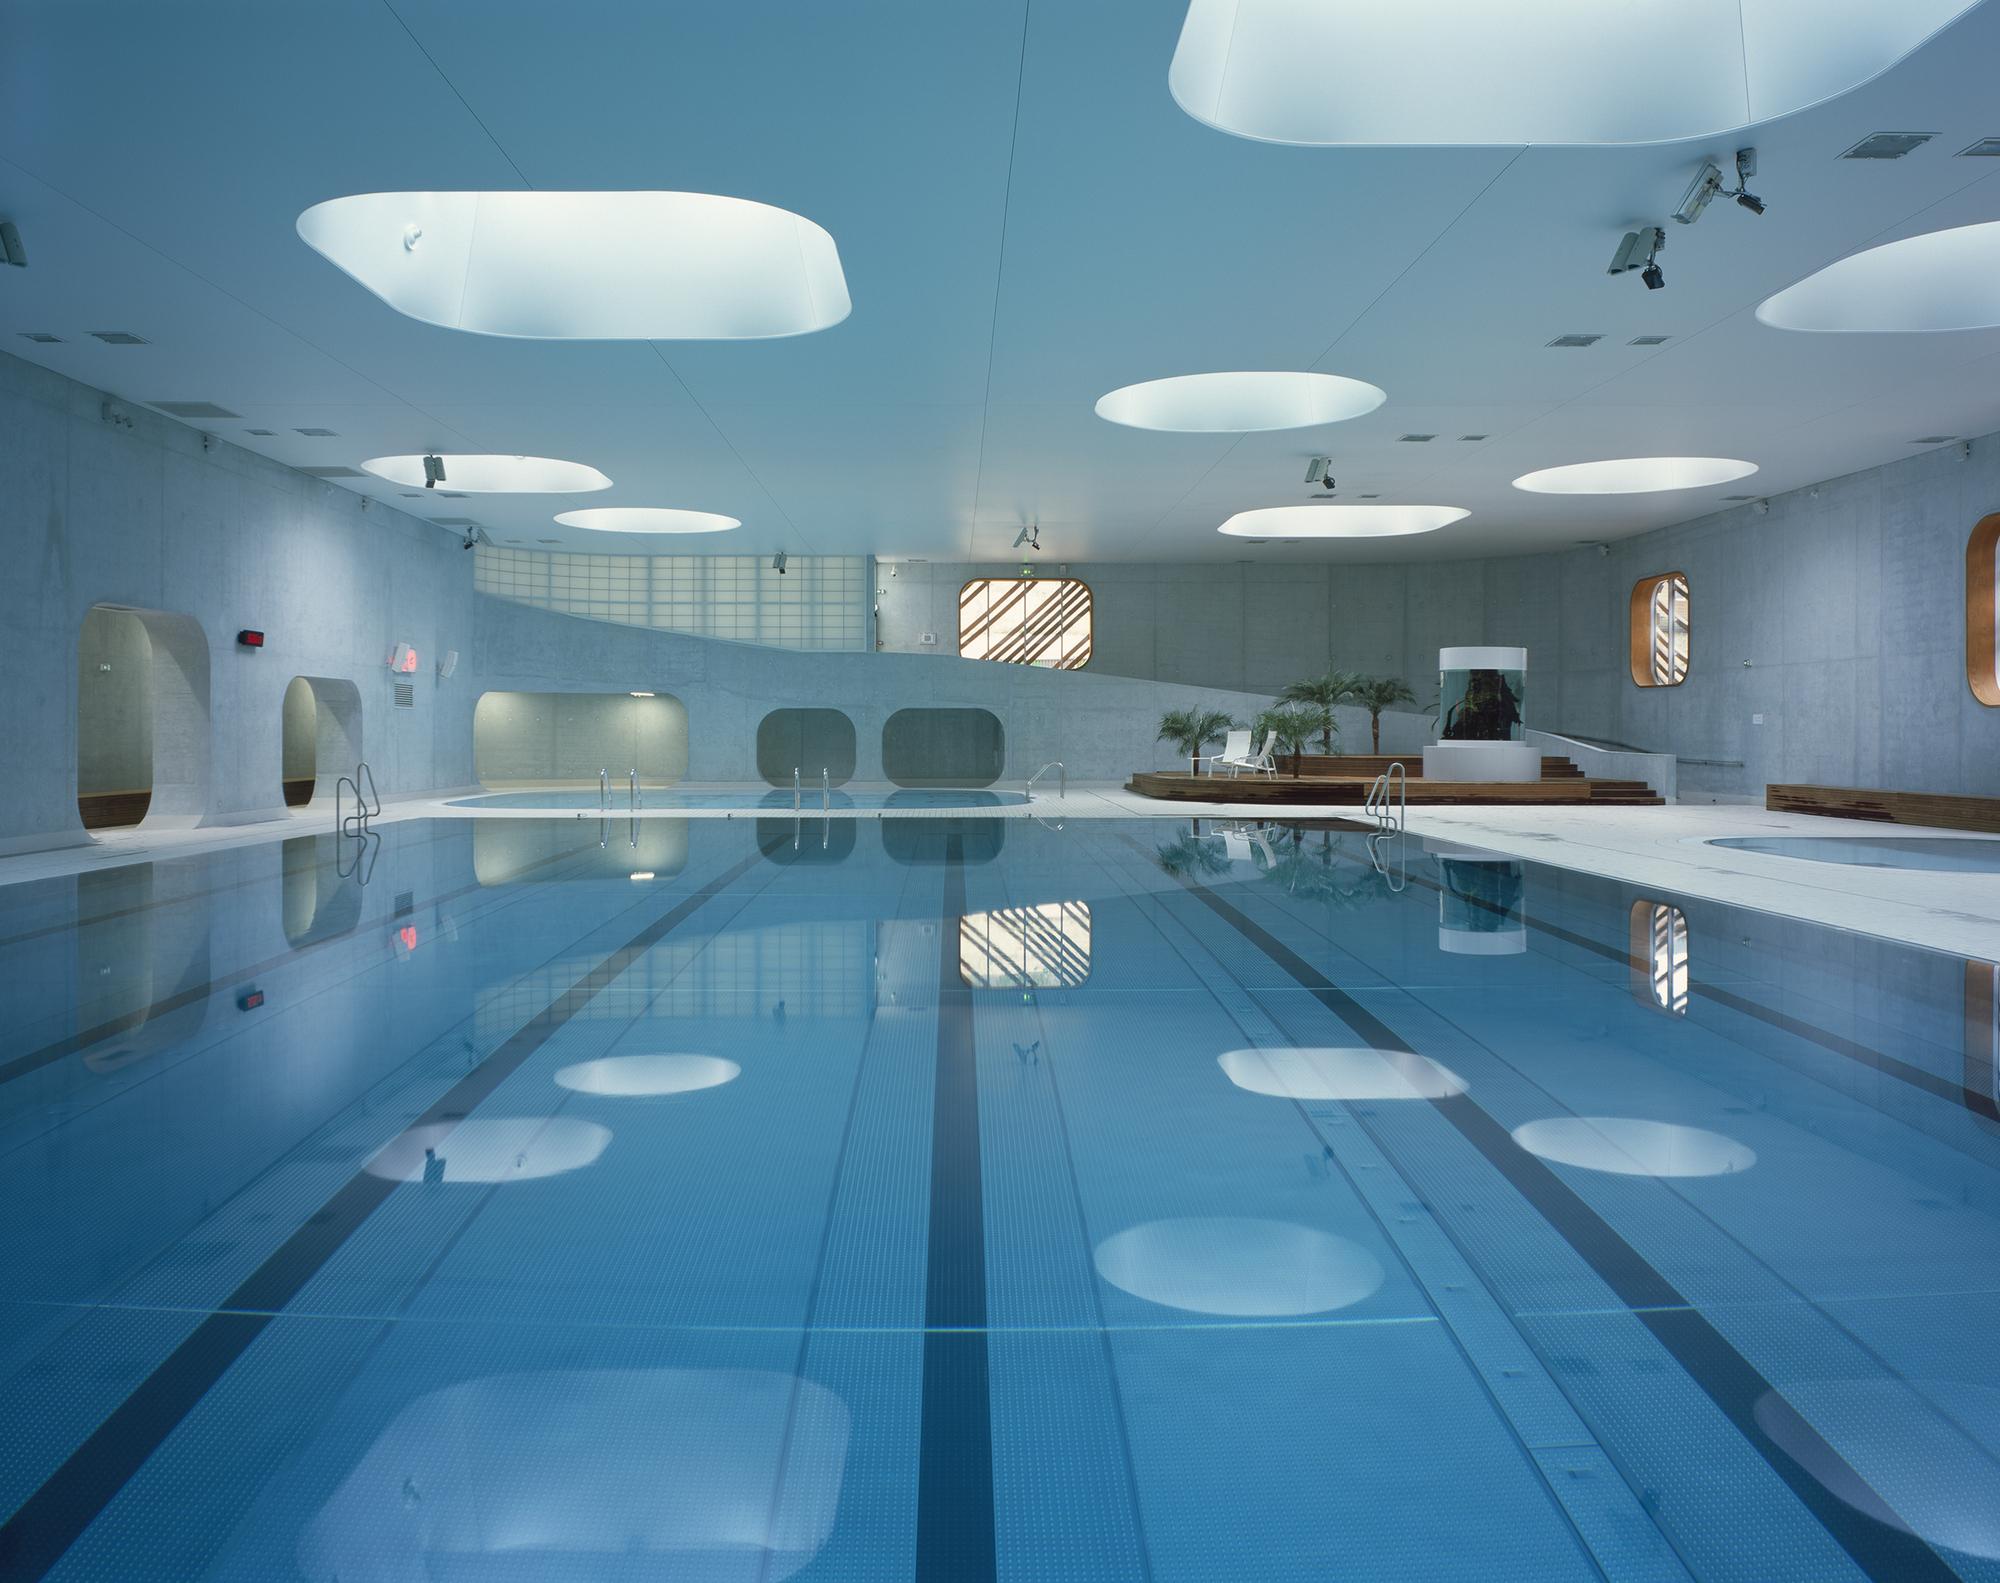 Feng shui swimming pool mikou studio archdaily for Piscine blue design le bouscat